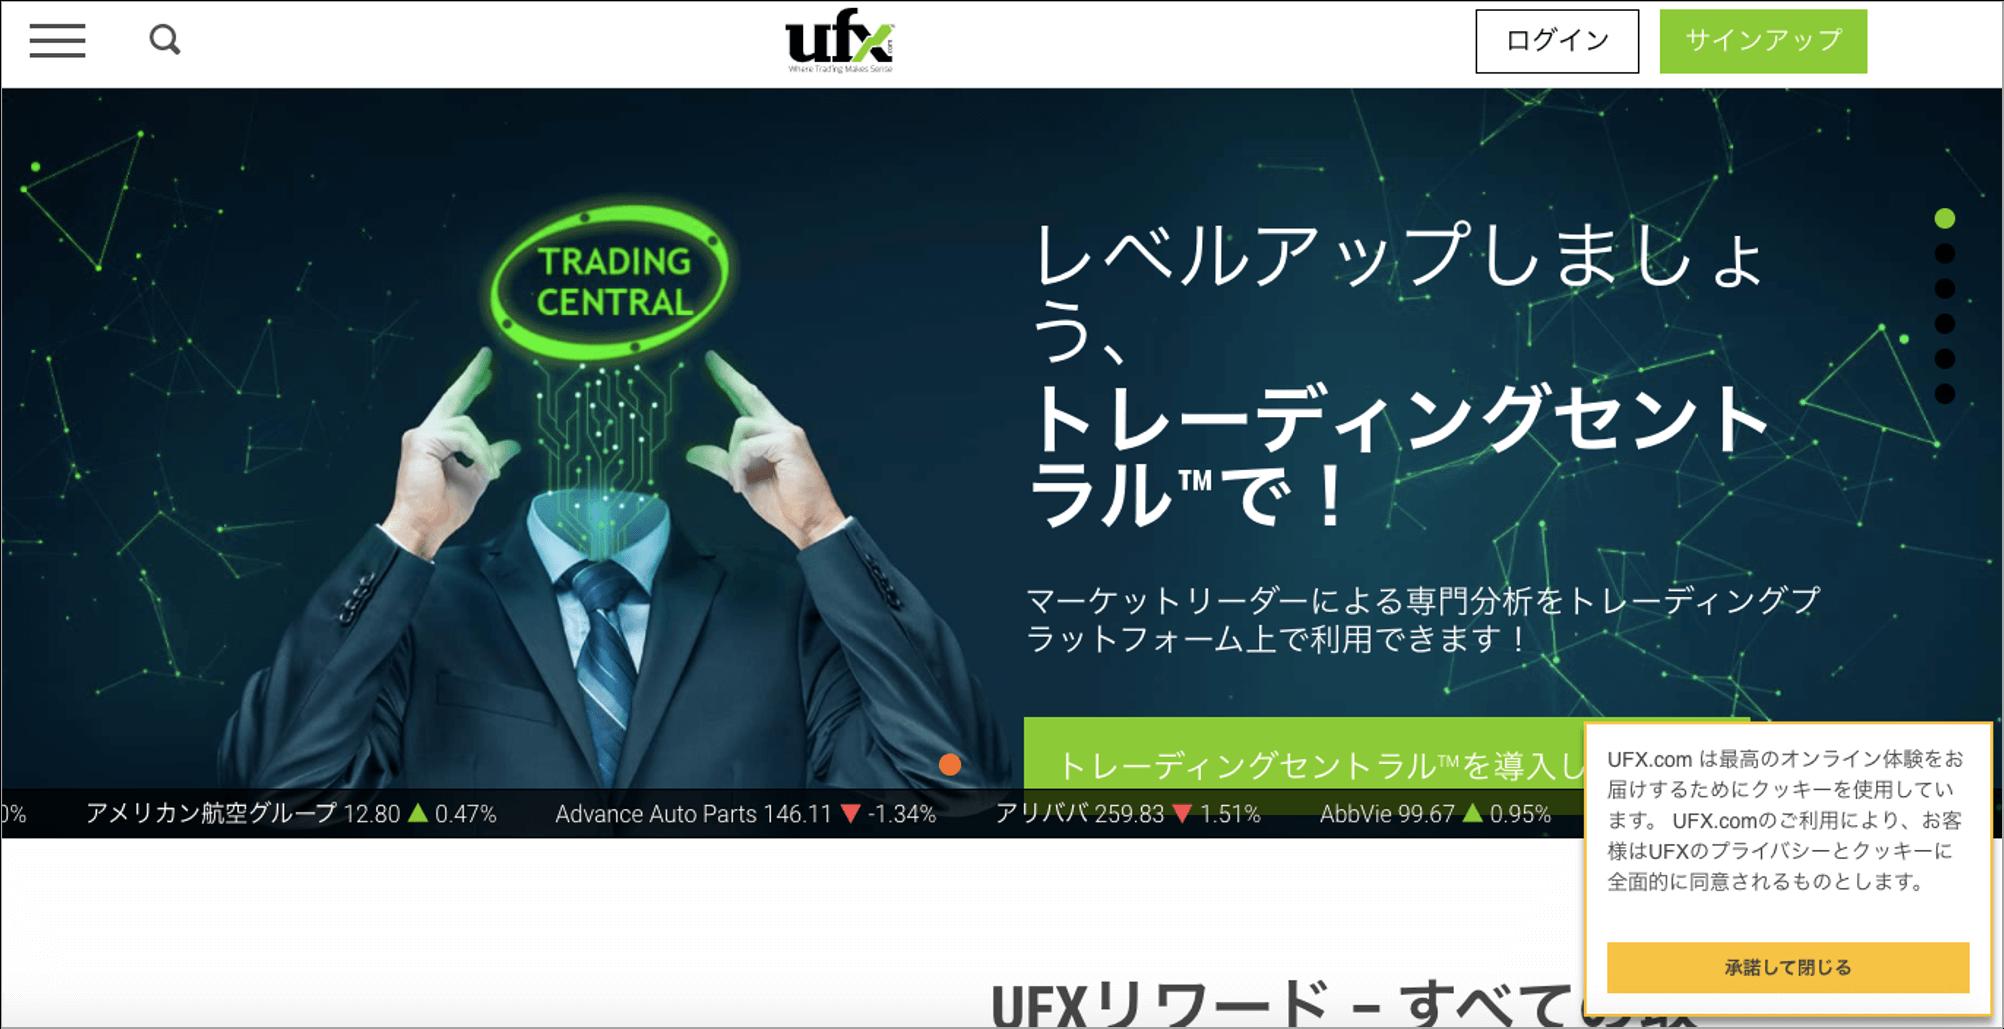 UFX ホームページ画像